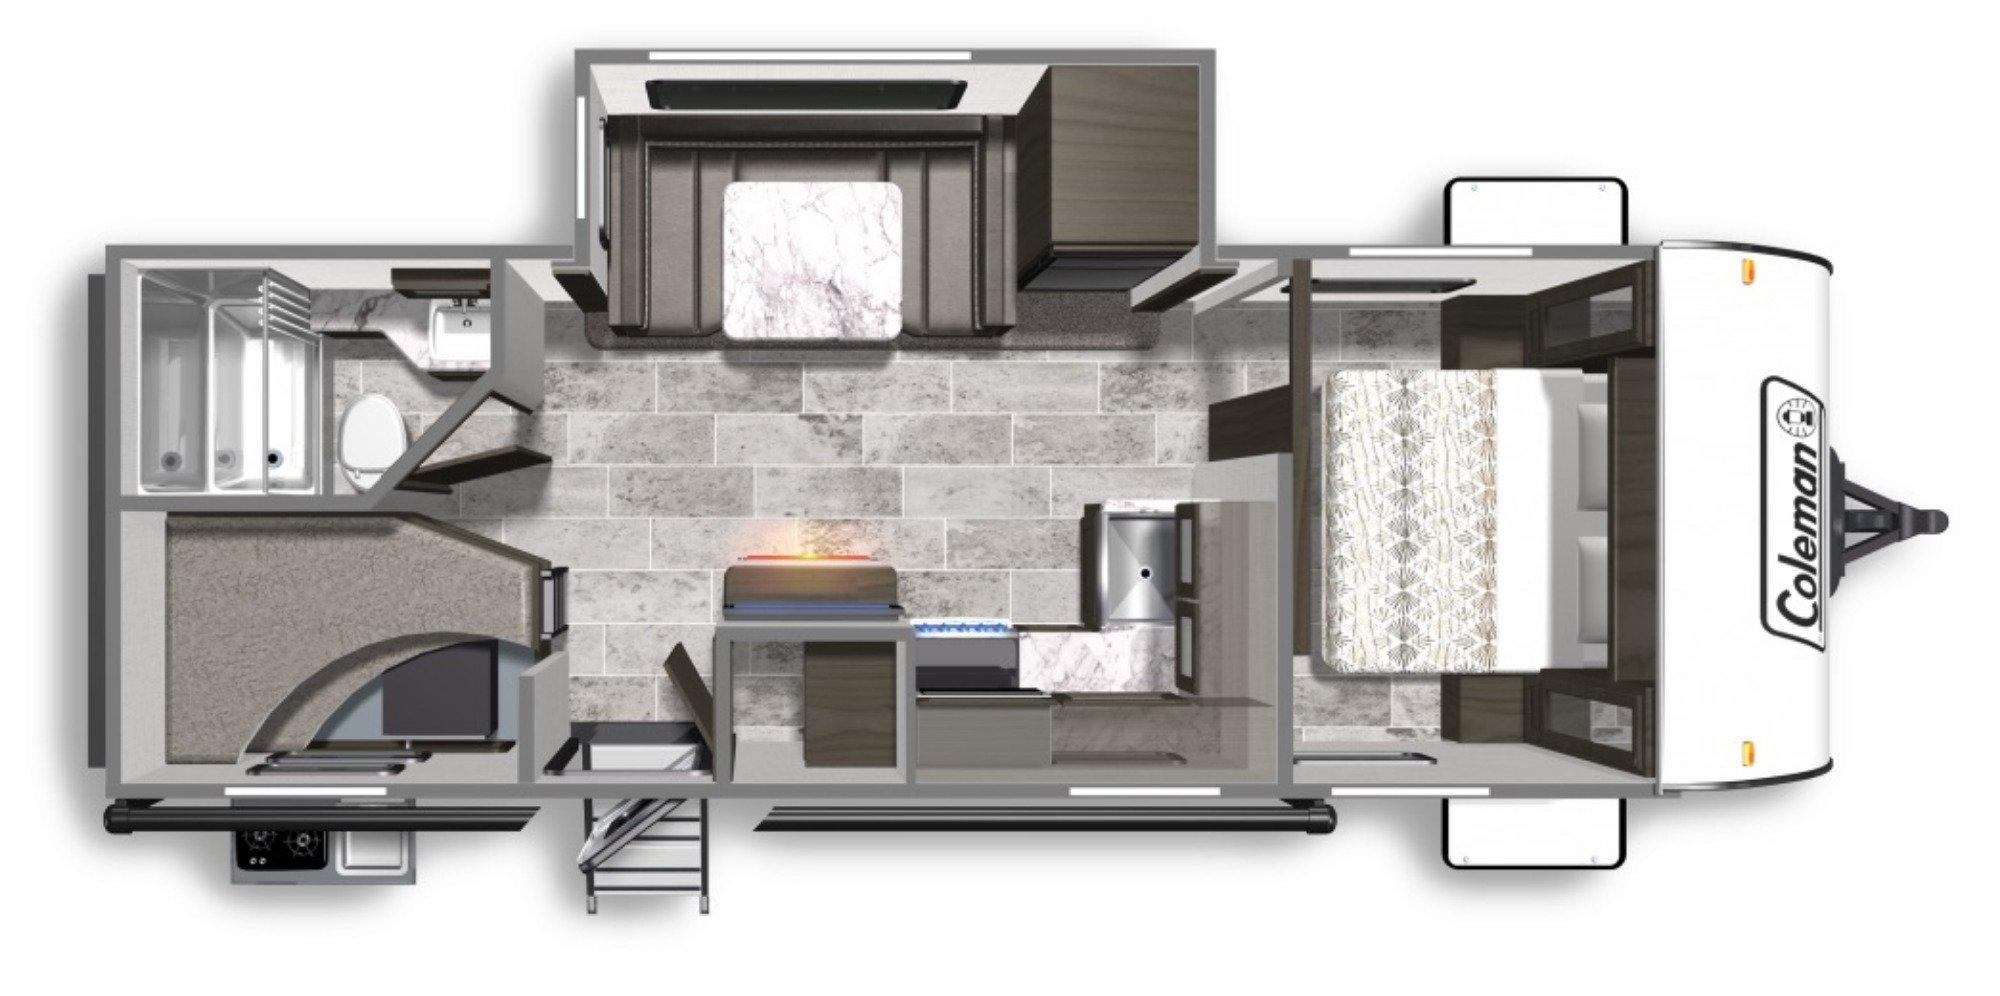 View Floor Plan for 2020 COLEMAN COLEMAN LIGHT 2455BH